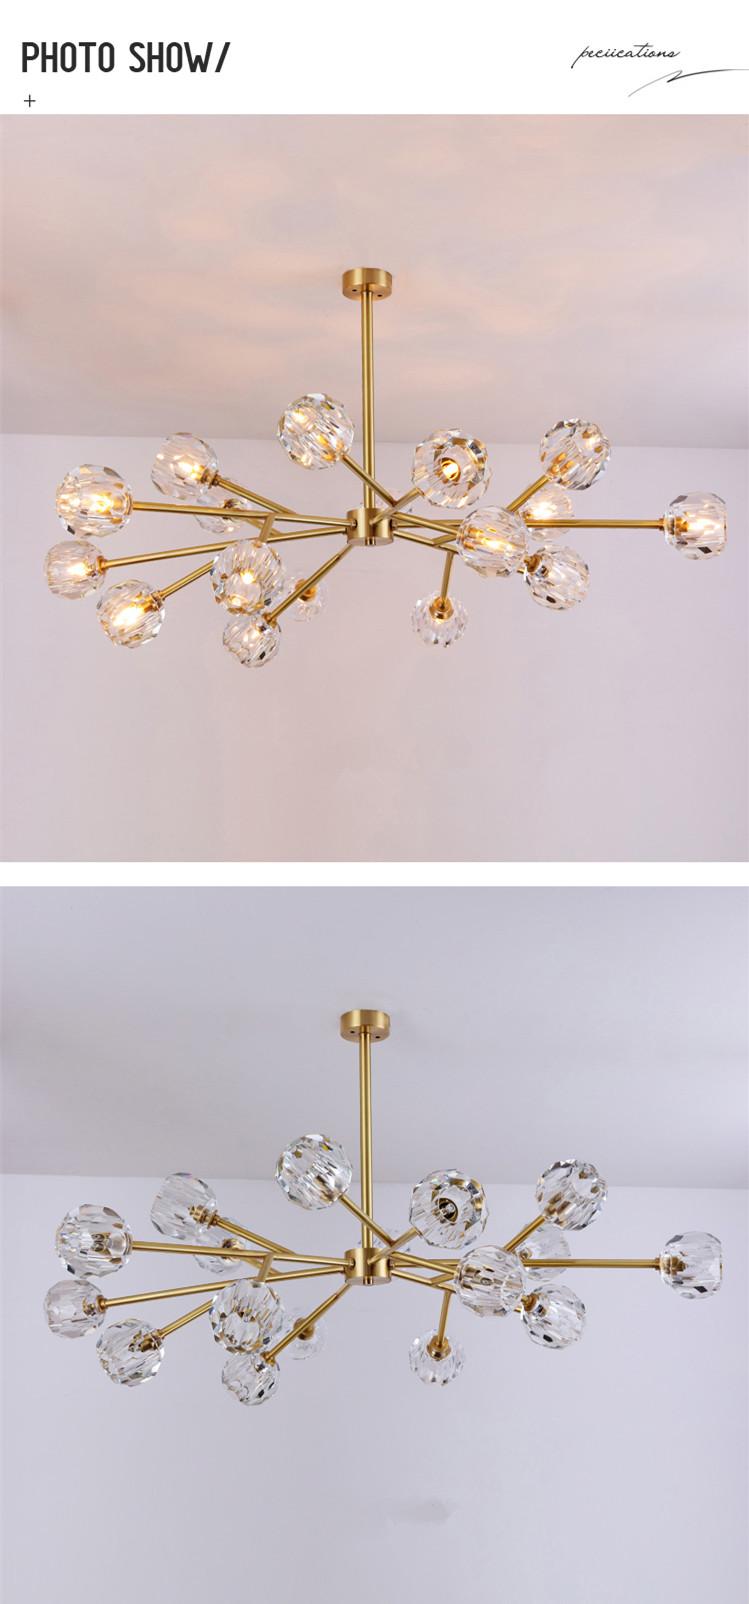 Wholesale nordic luxury modern contemporary art decor decoration copper arm glass globe ball led lamp Chandelier pendant light